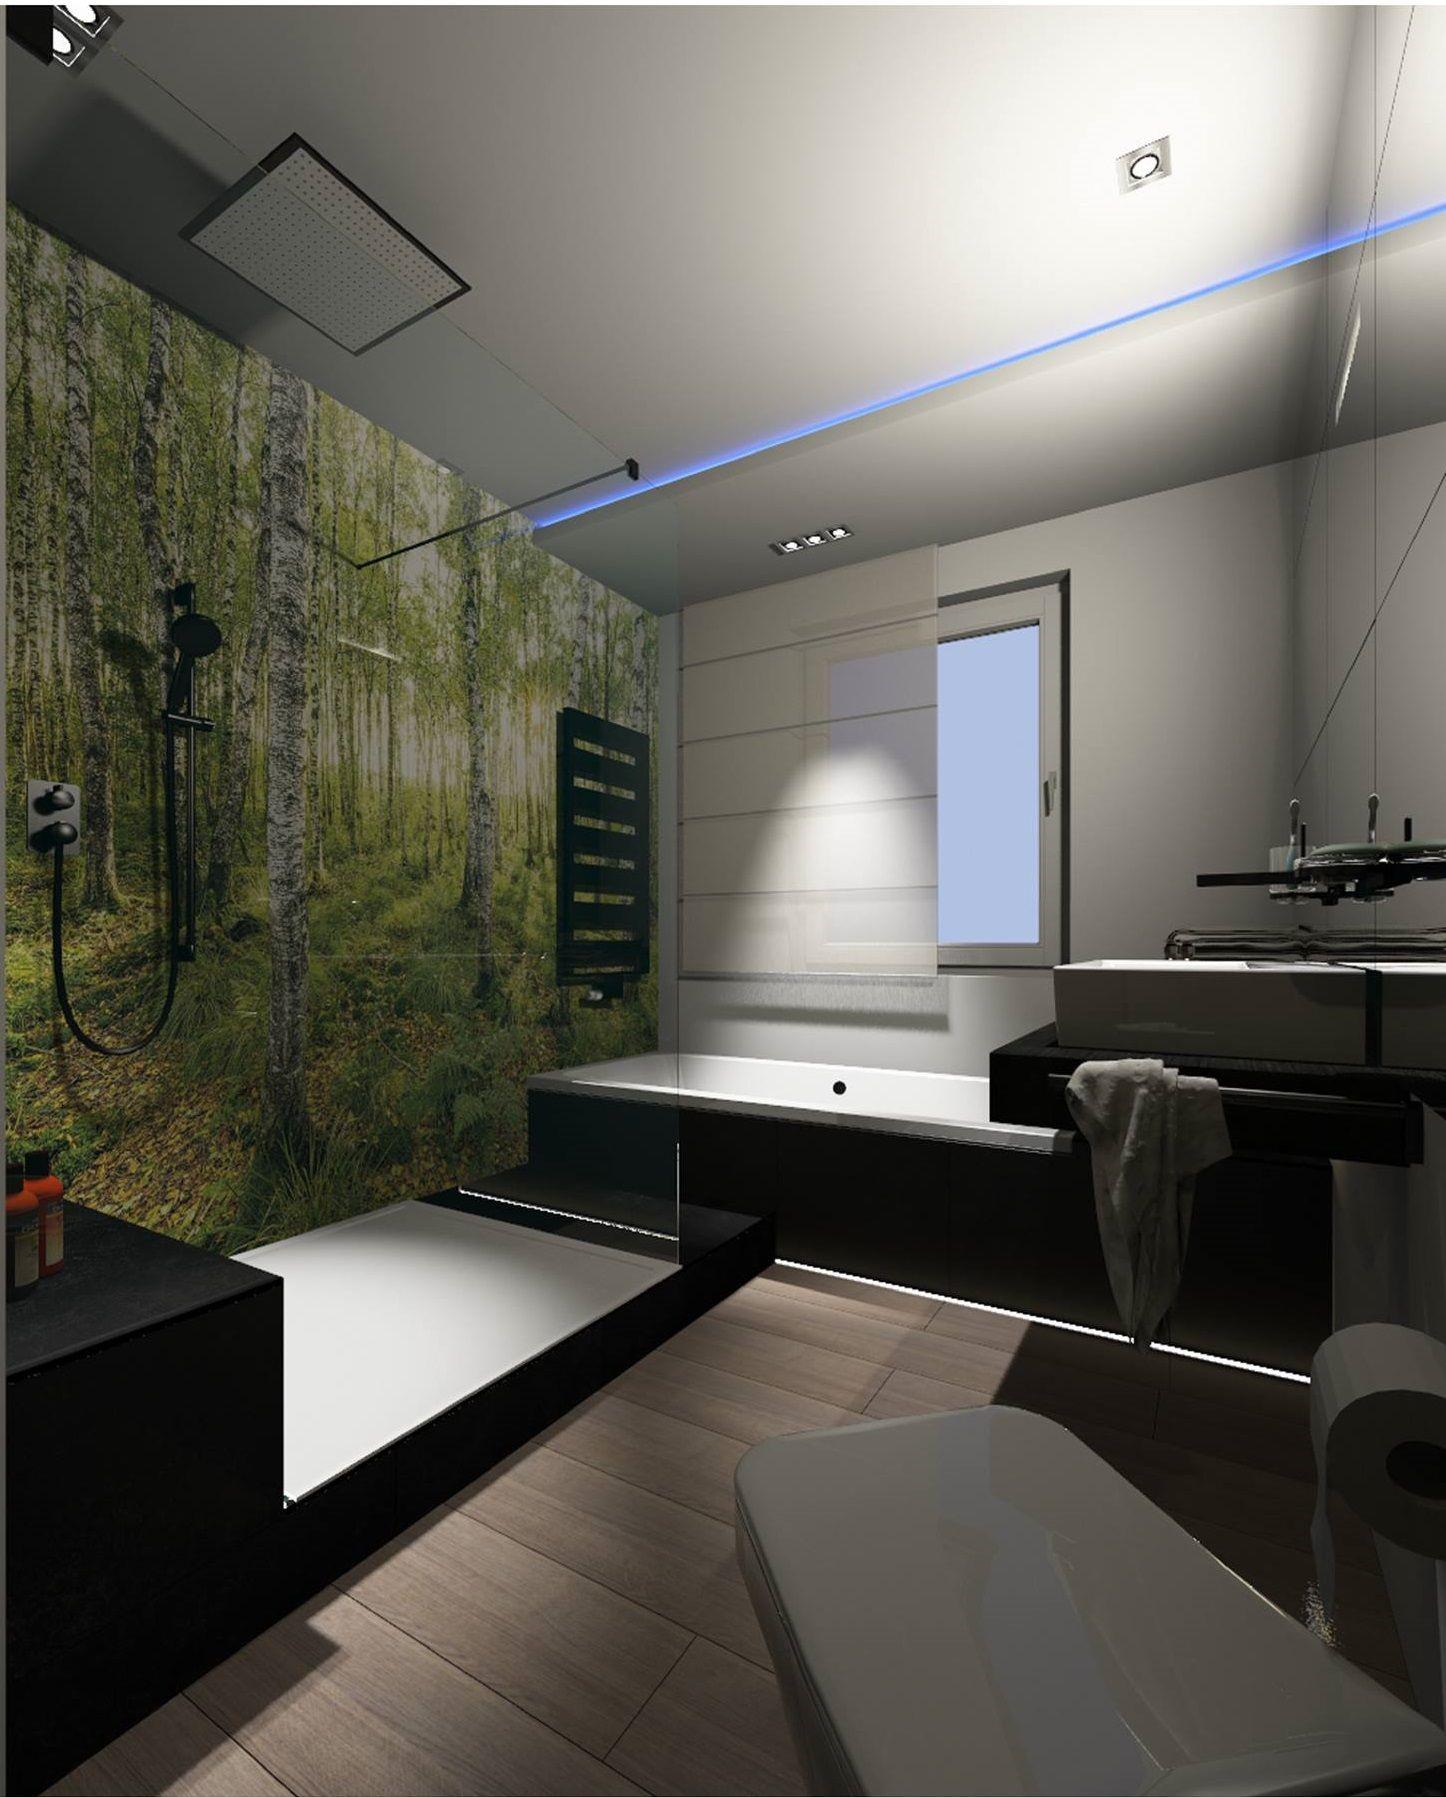 Kleine Exklusive Bader Torsten Muller Moderne Kleine Badezimmer Badezimmer Schone Badezimmer